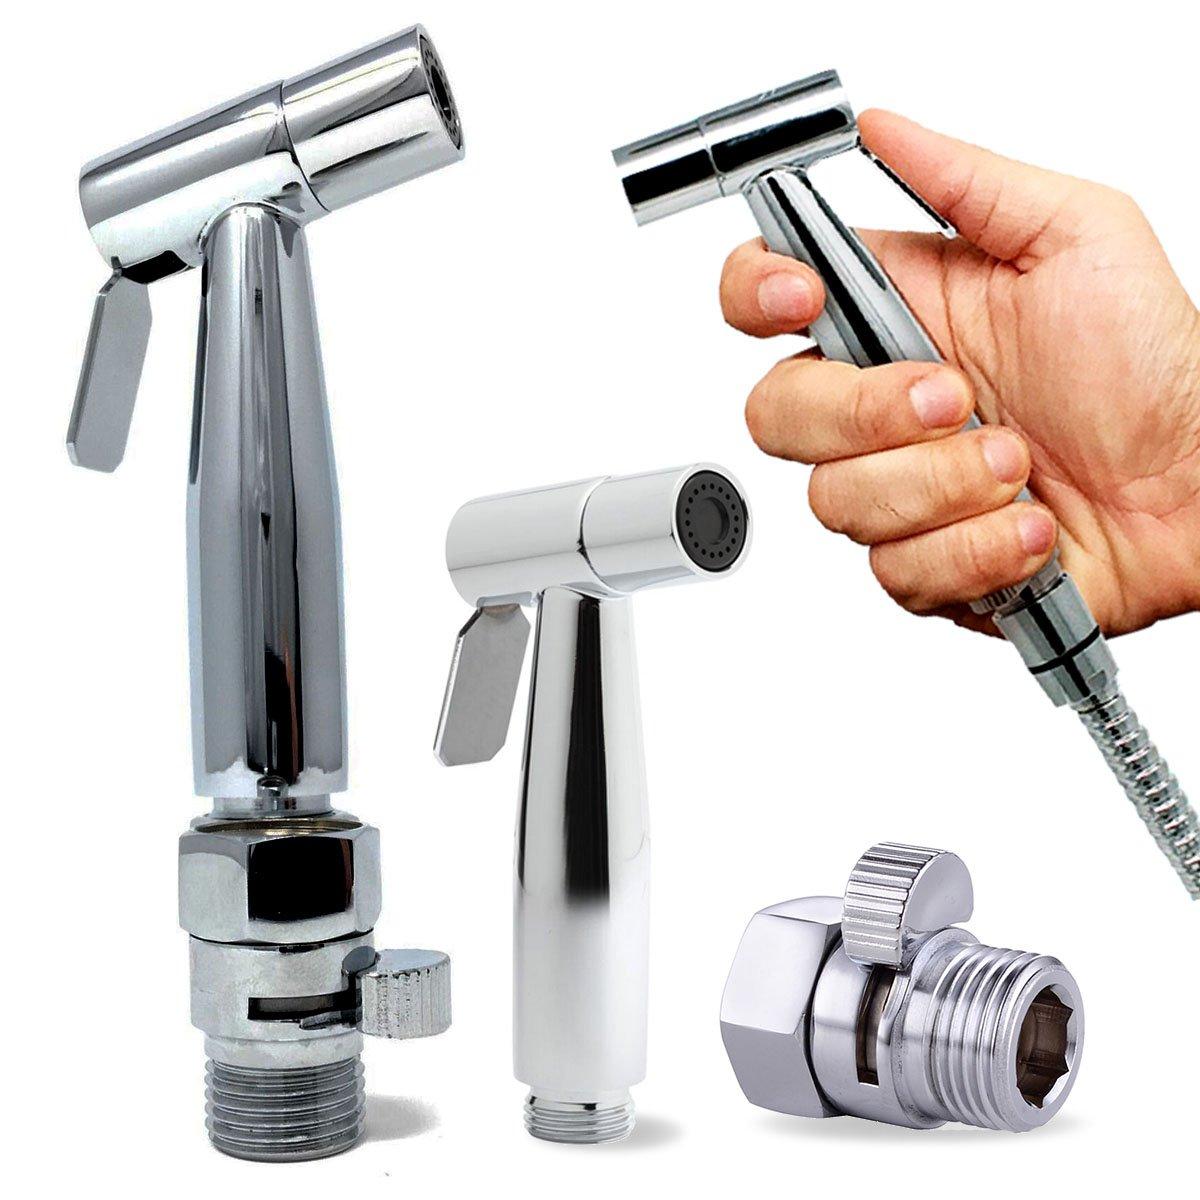 Strong/Soft Diaper Sprayer with Pressure Control Valve/Handheld Diaper Sprayer for Toilet/Bidet Toilet Sprayer – Perfect Bottom Cleaner/Personal Hygiene with the Private Bidet Sprayer